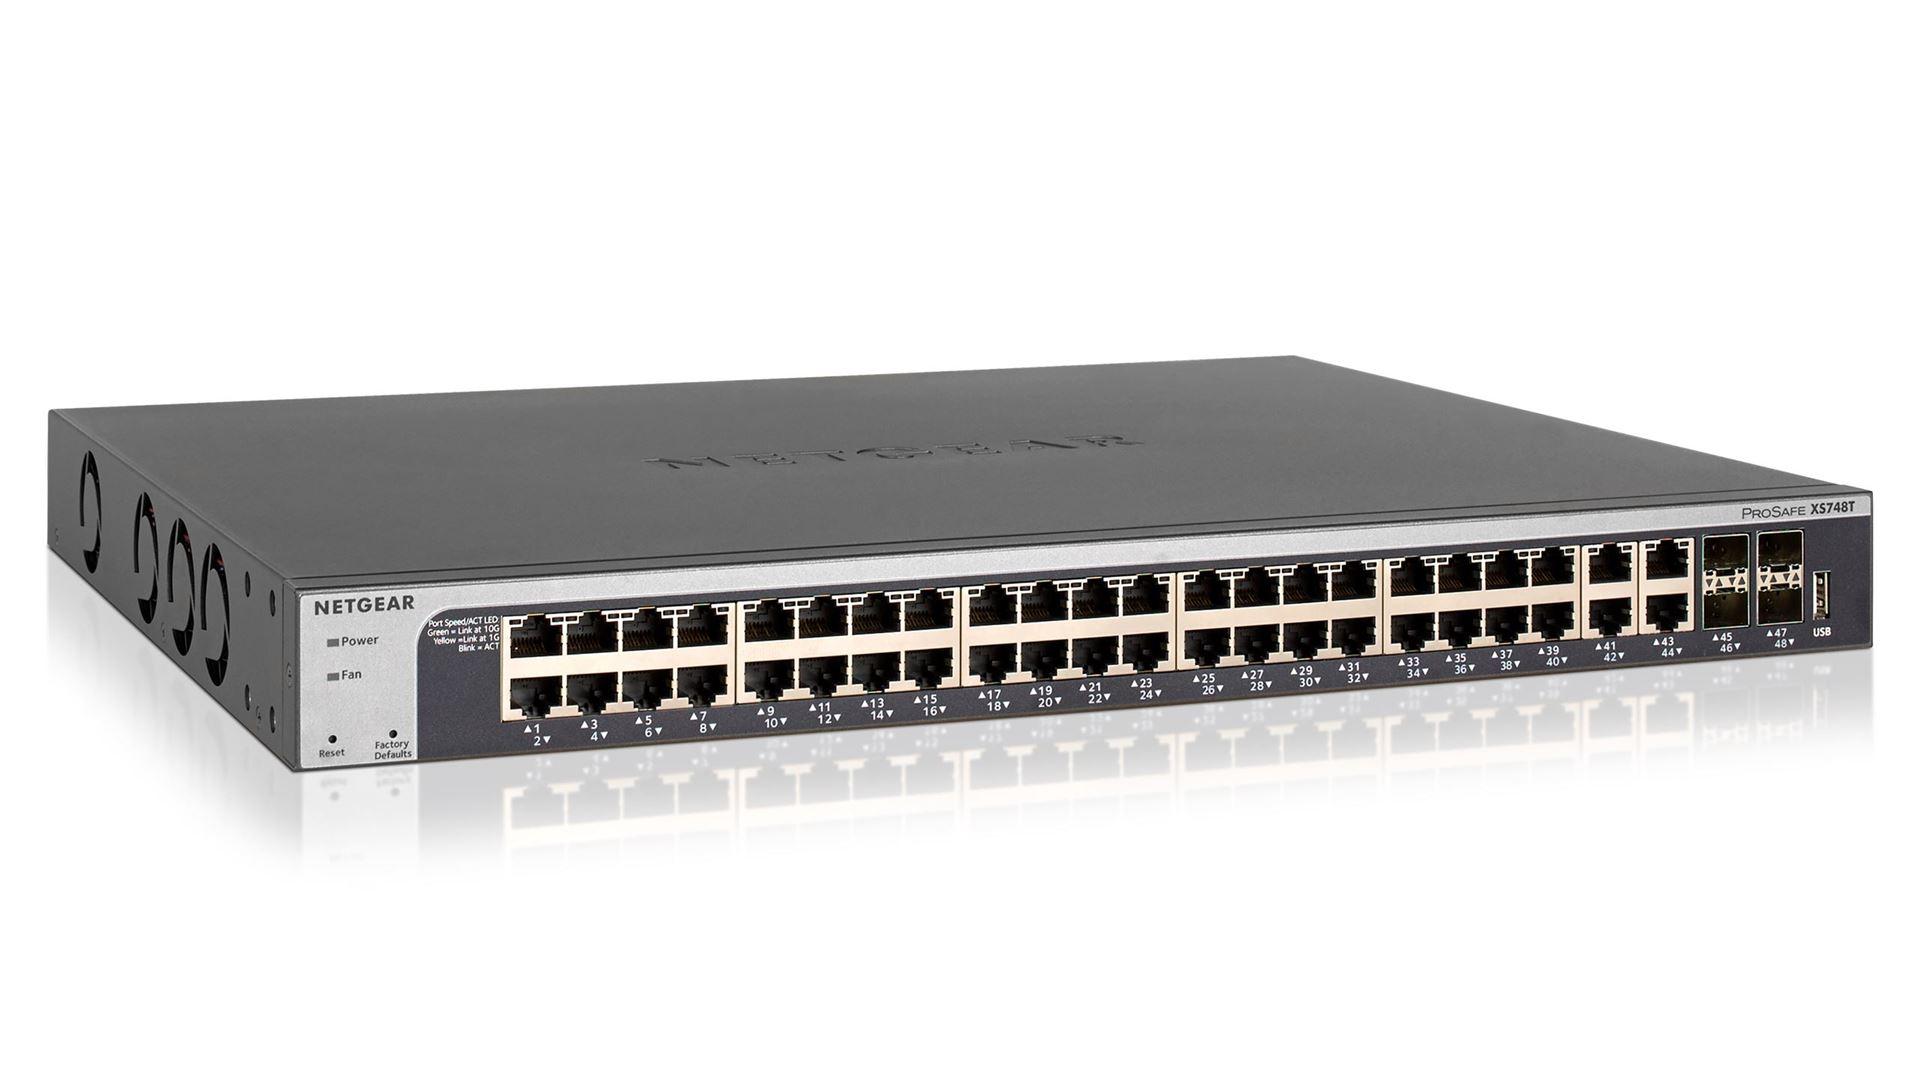 ProSAFE® XS748T 48-Port 10-Gigabit Ethernet  Smart Managed Switch (XS748T)